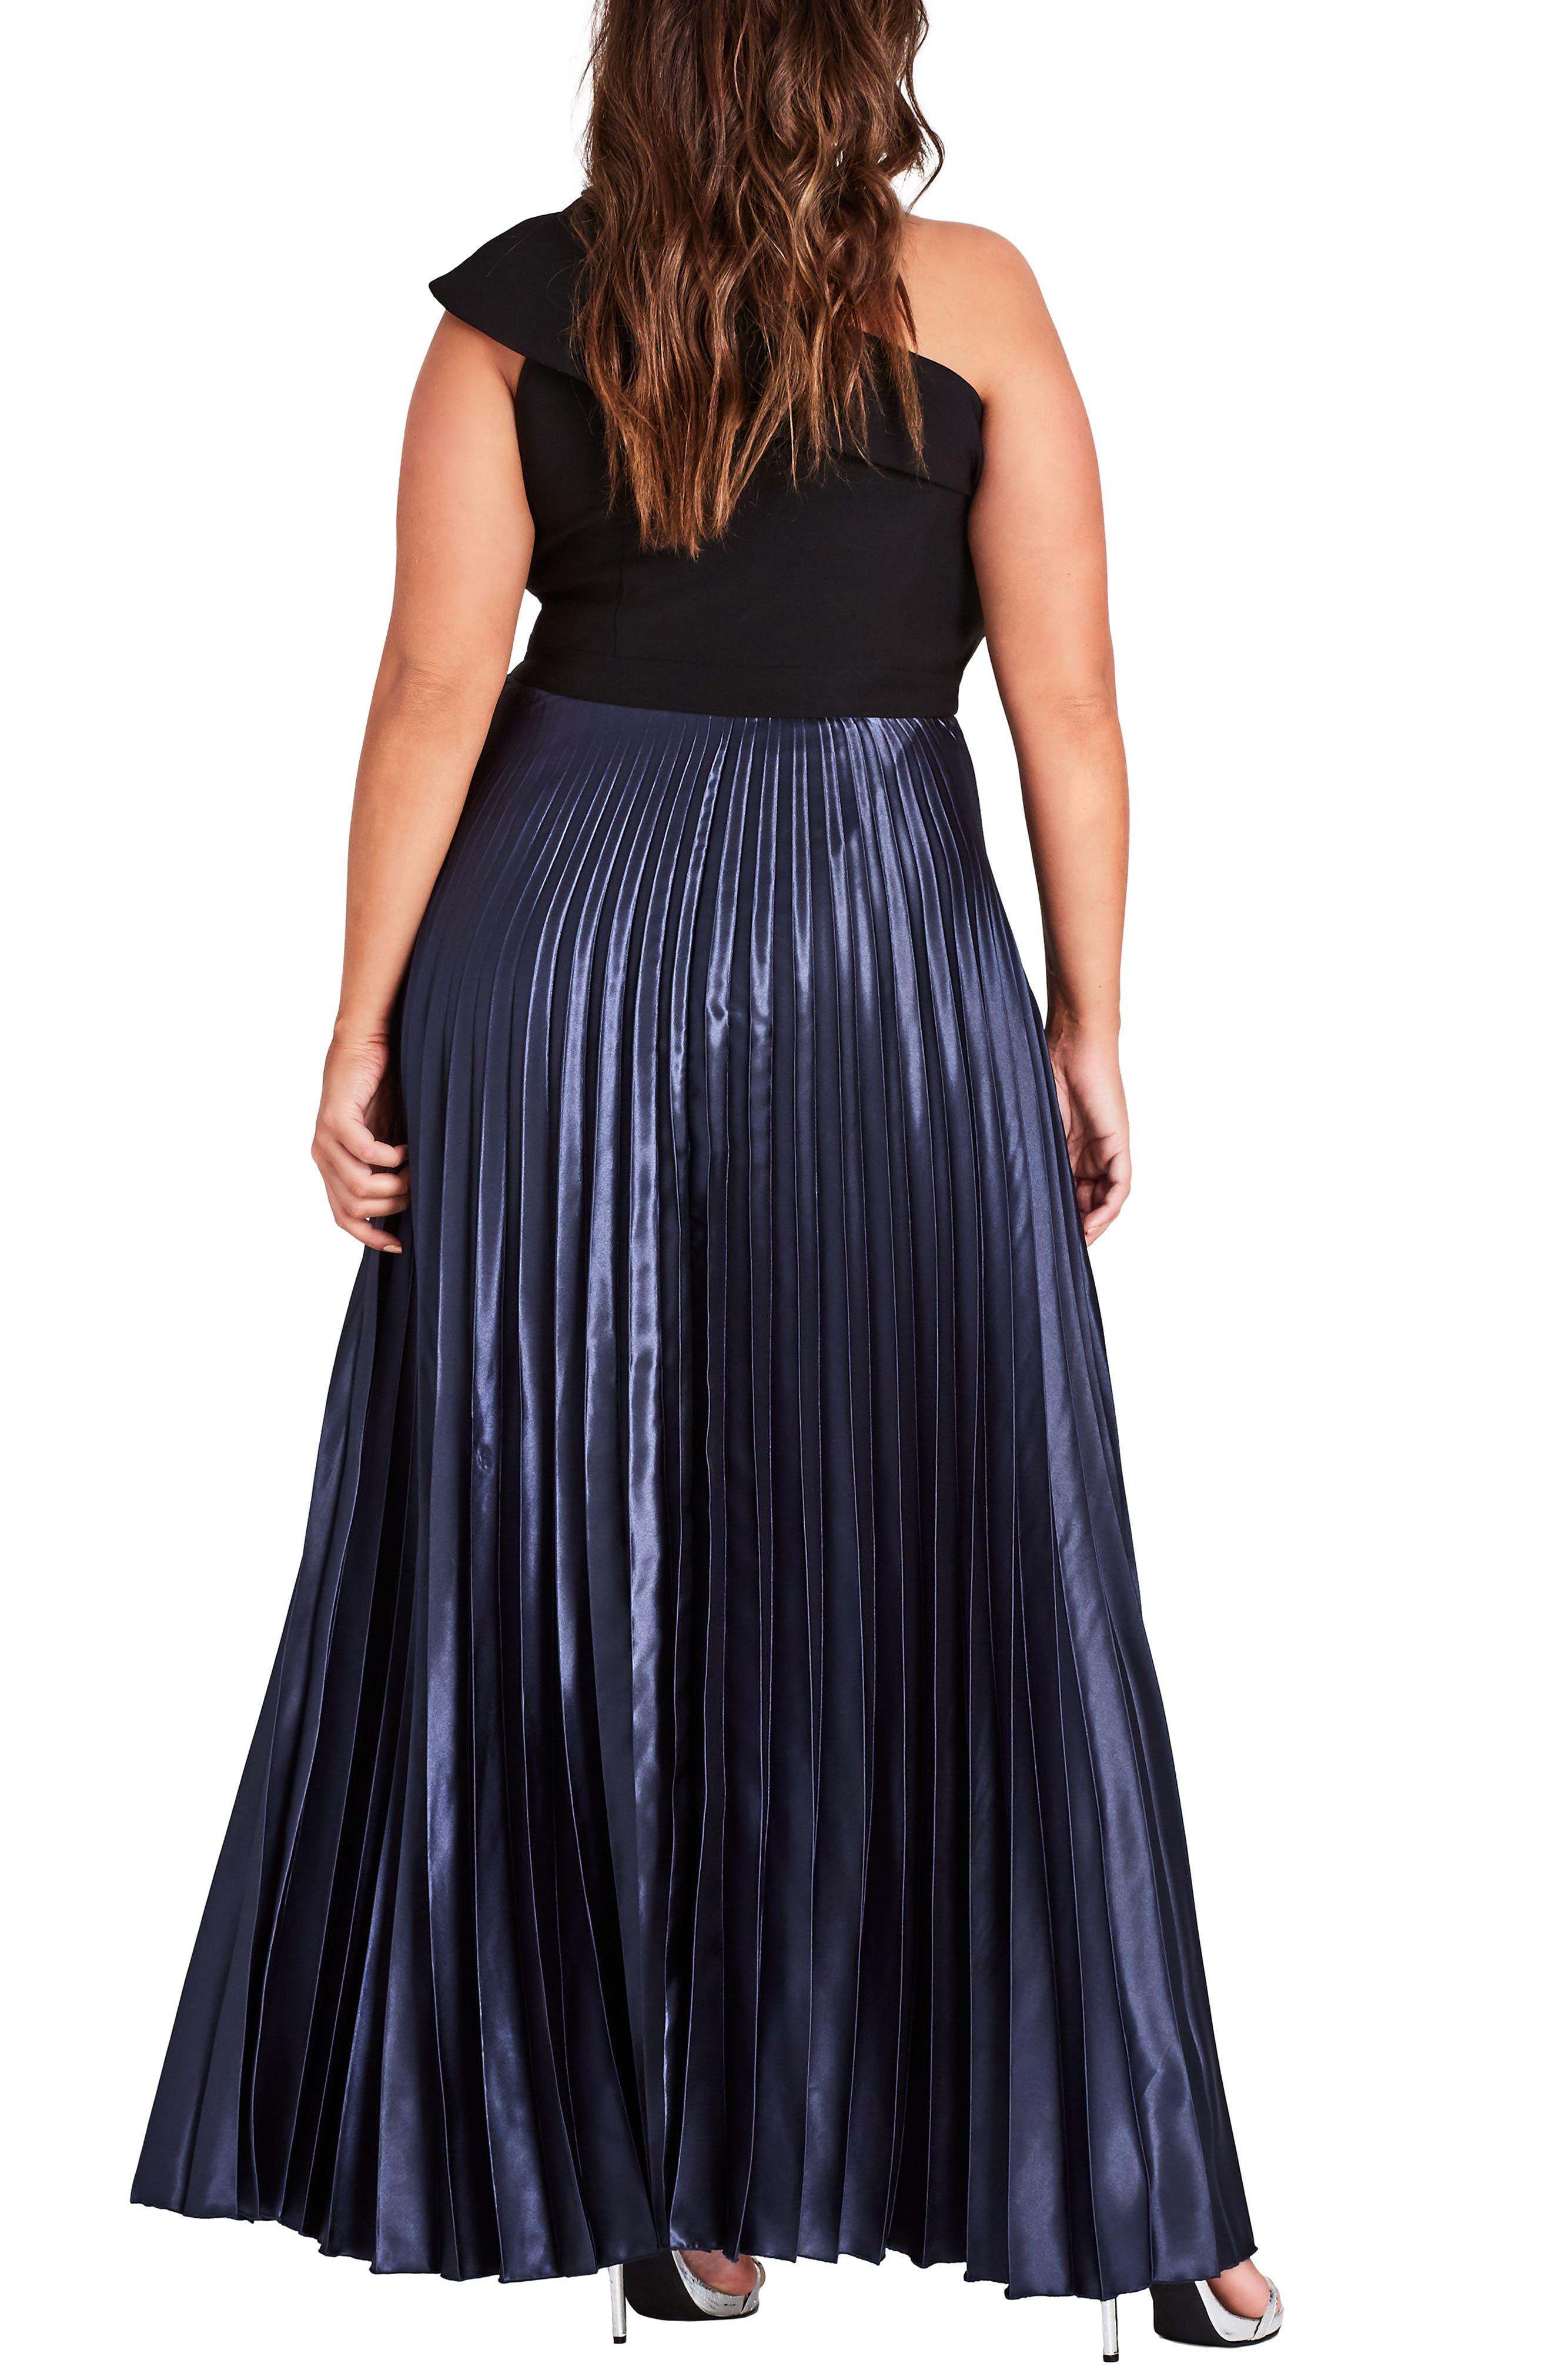 Rosa One Shoulder Pleat Maxi Dress,                             Alternate thumbnail 2, color,                             Smoke